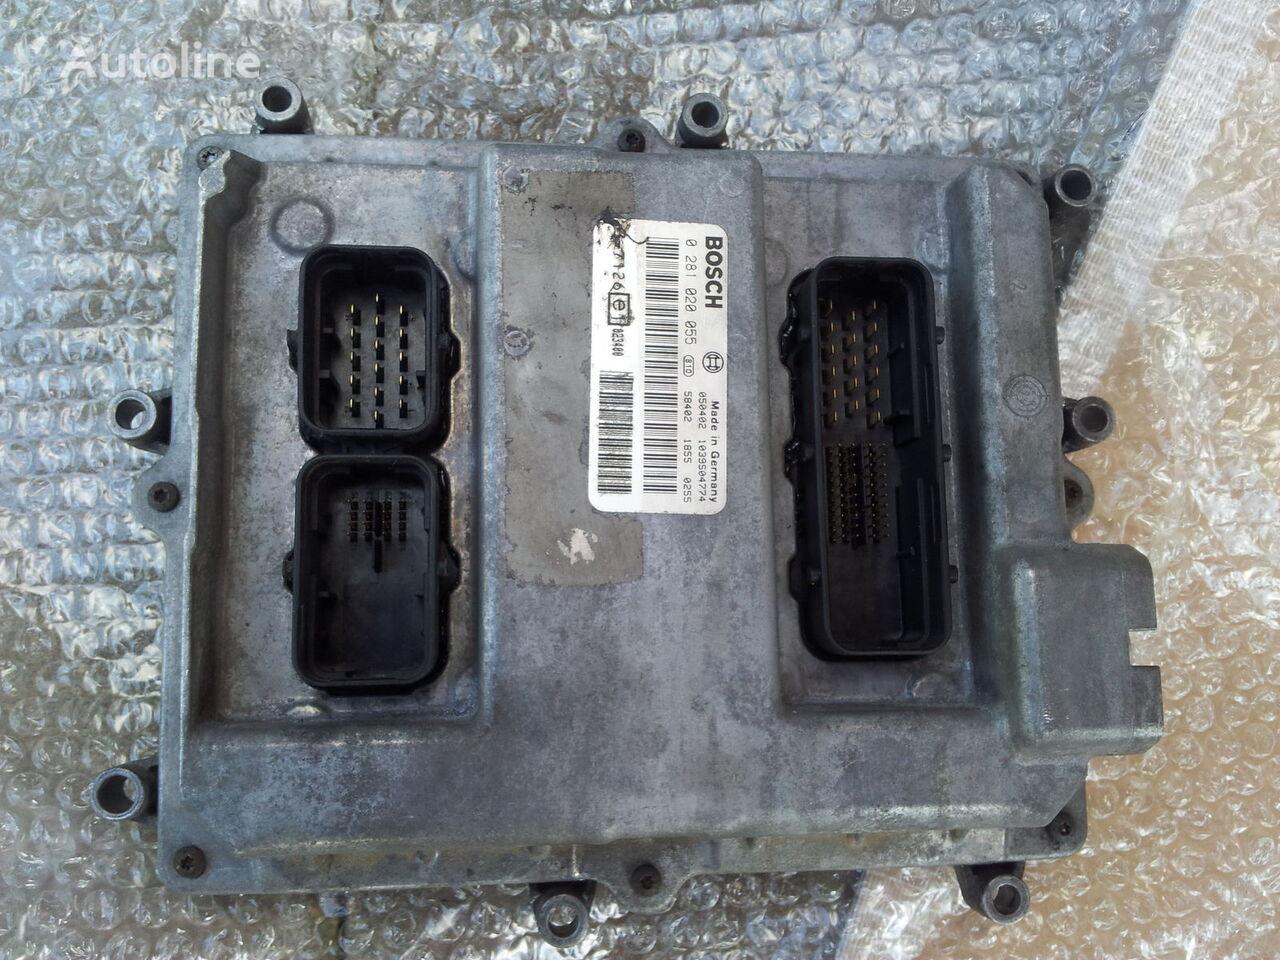 MAN Common Rail EDC, ECU electronic diesel control 0281020055, D2066LF01, 51258037126, 51258337169, 51258037127, 51258337168 bloco de controlo para MAN TGA camião tractor